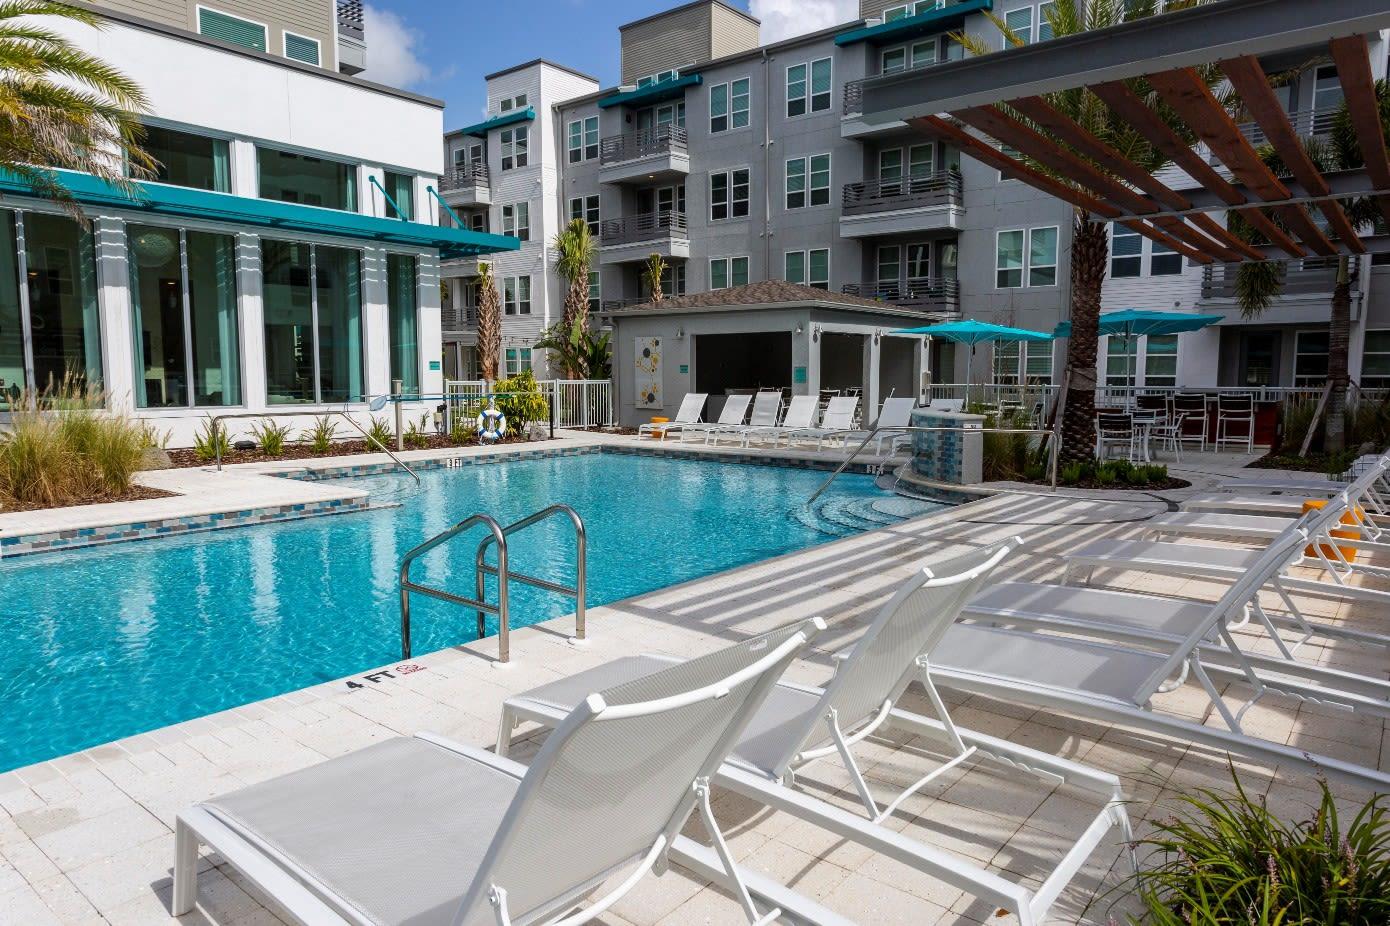 Pool Area at 50 Paramount Apartments in Tampa Florida